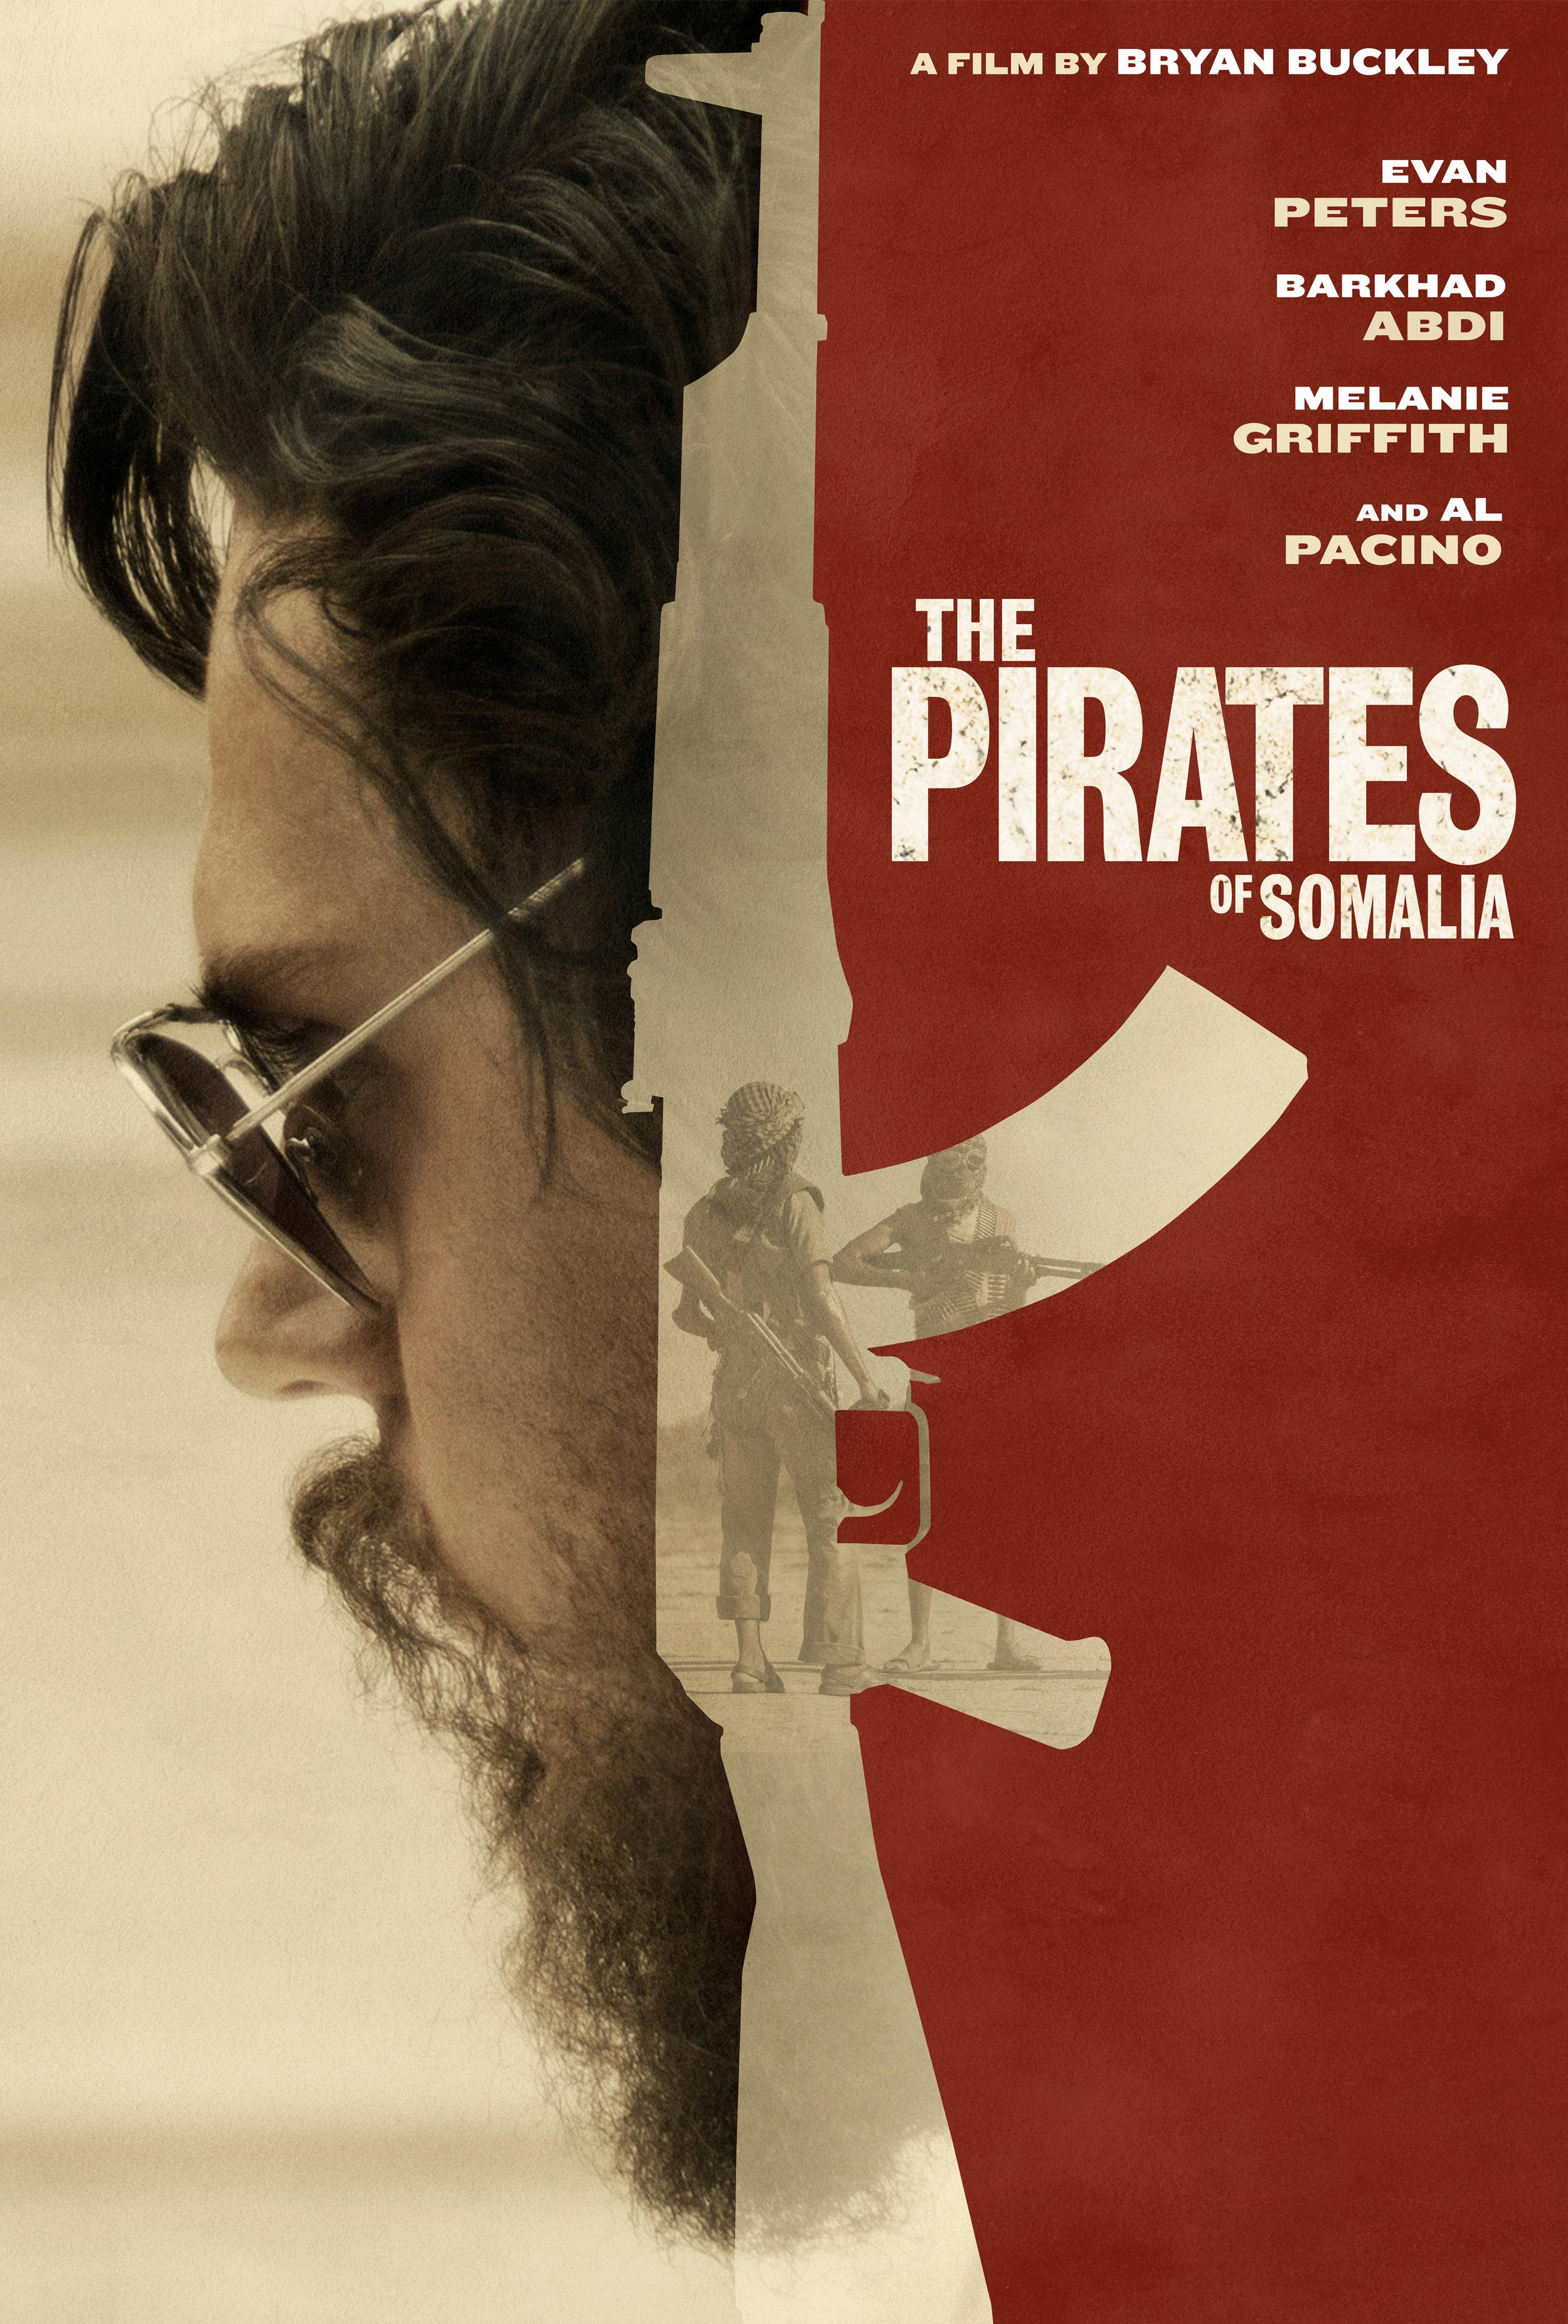 THE_PIRATES_OF_SOMALIA_KA.jpg